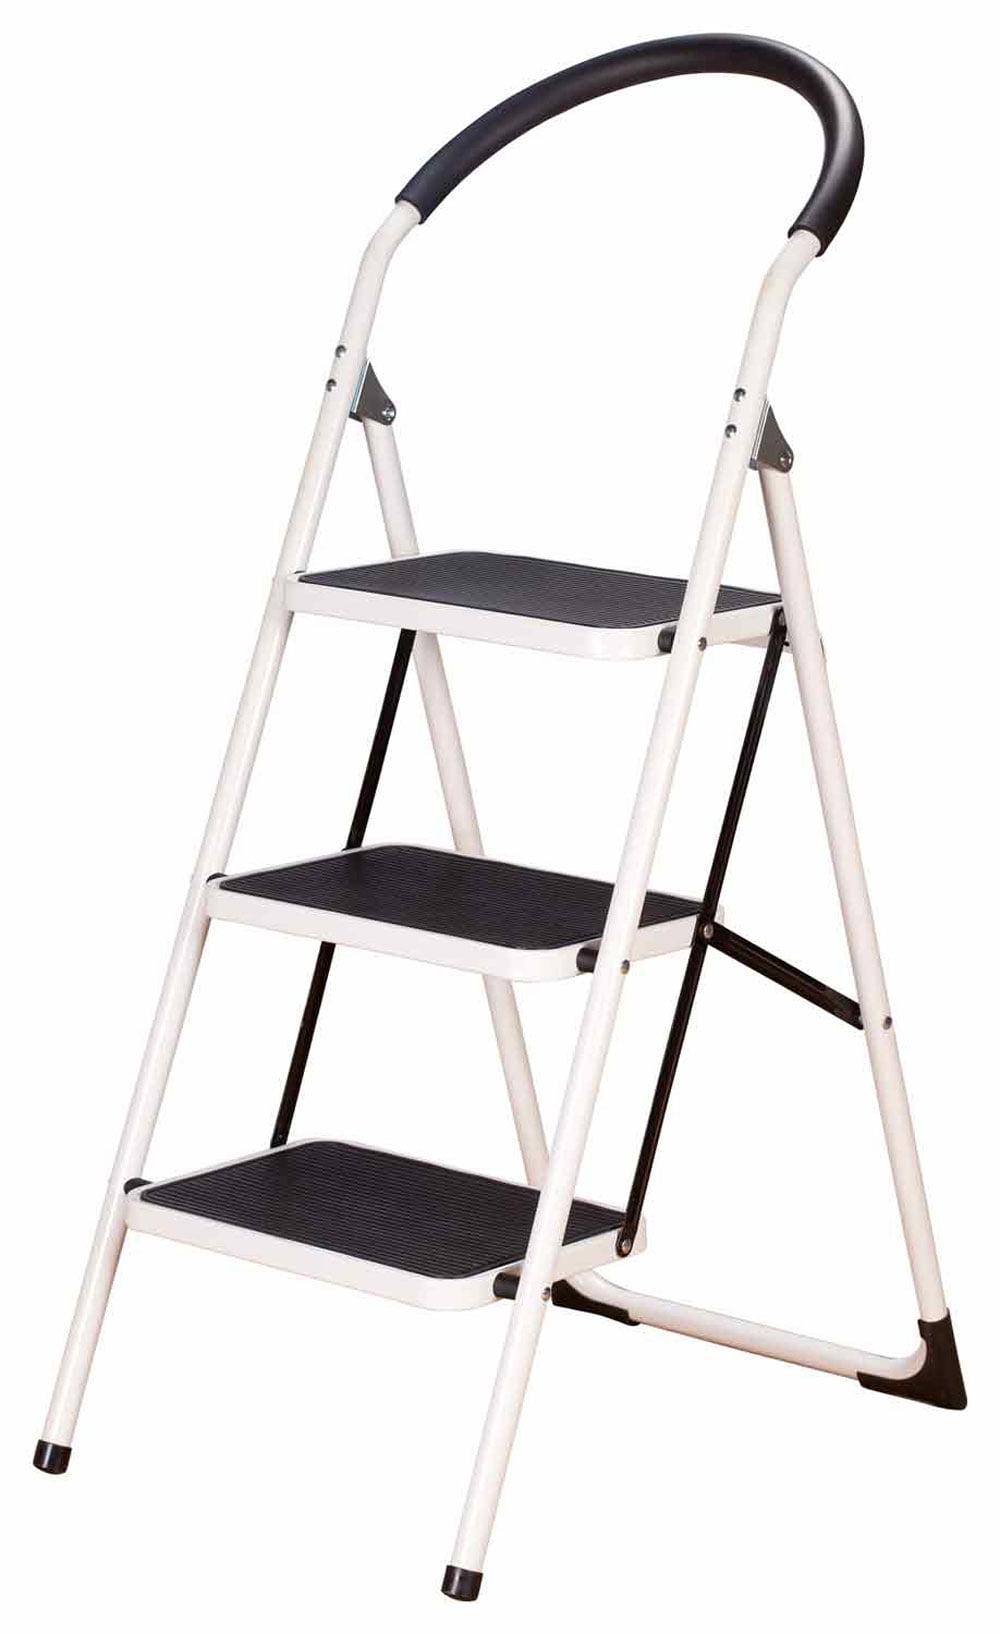 Livingsure 3 Step Ladder Stool Combo With Handgrip Anti